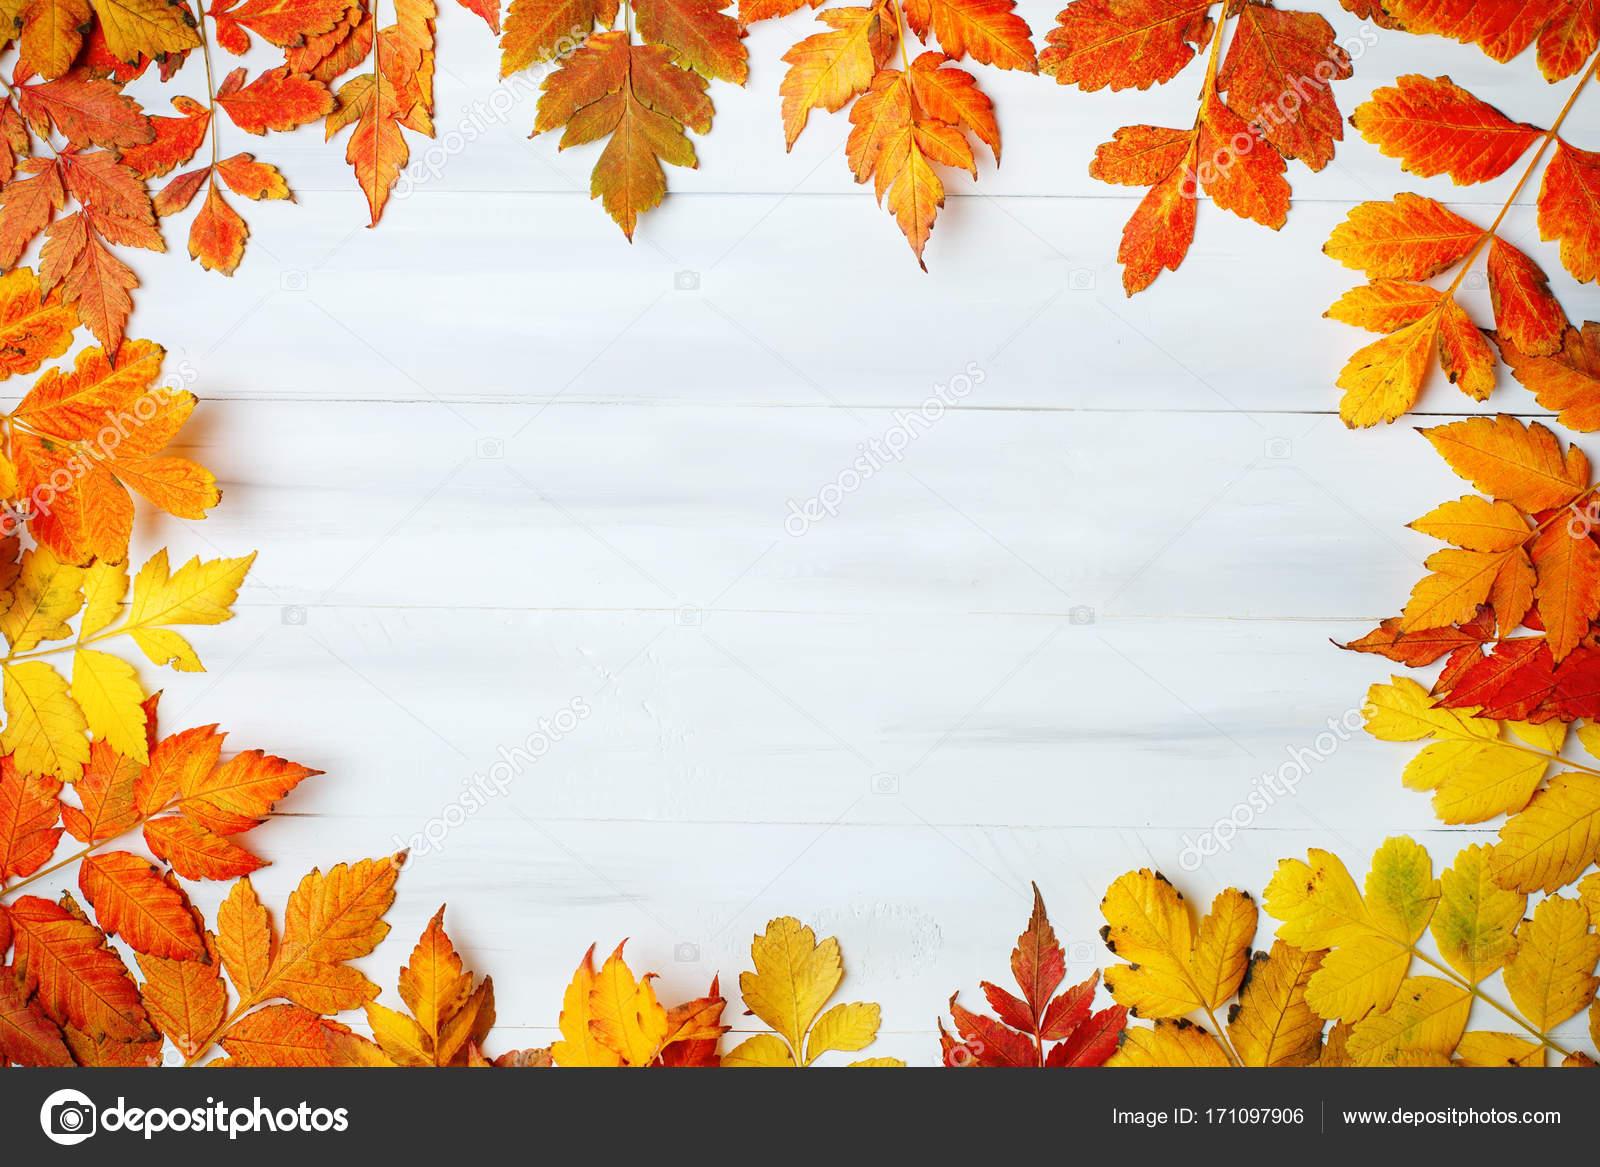 Fotos hoja blanca decorada mesa de madera blanca - Descargar autumn leaves ...